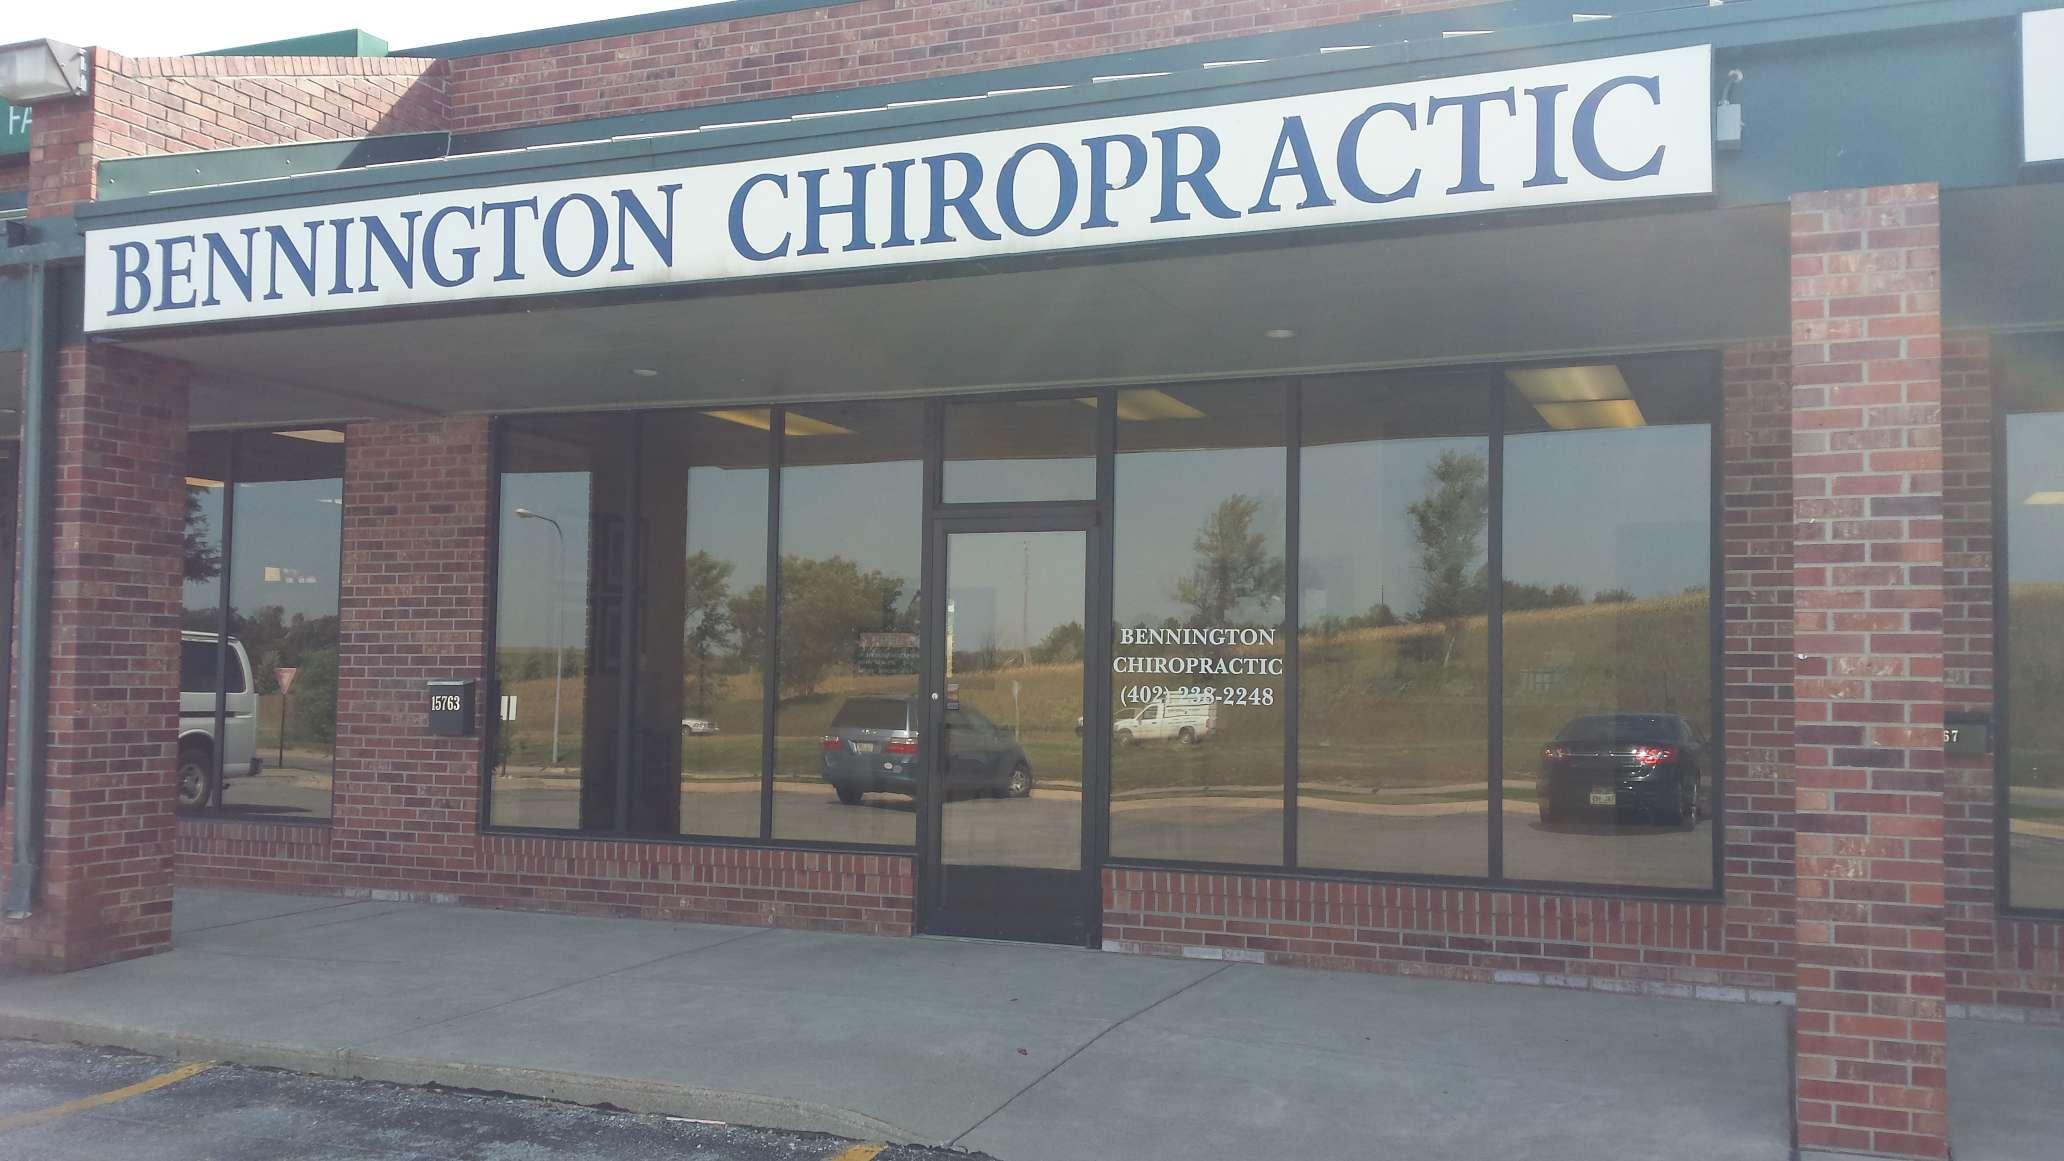 Bennington Chiropractic